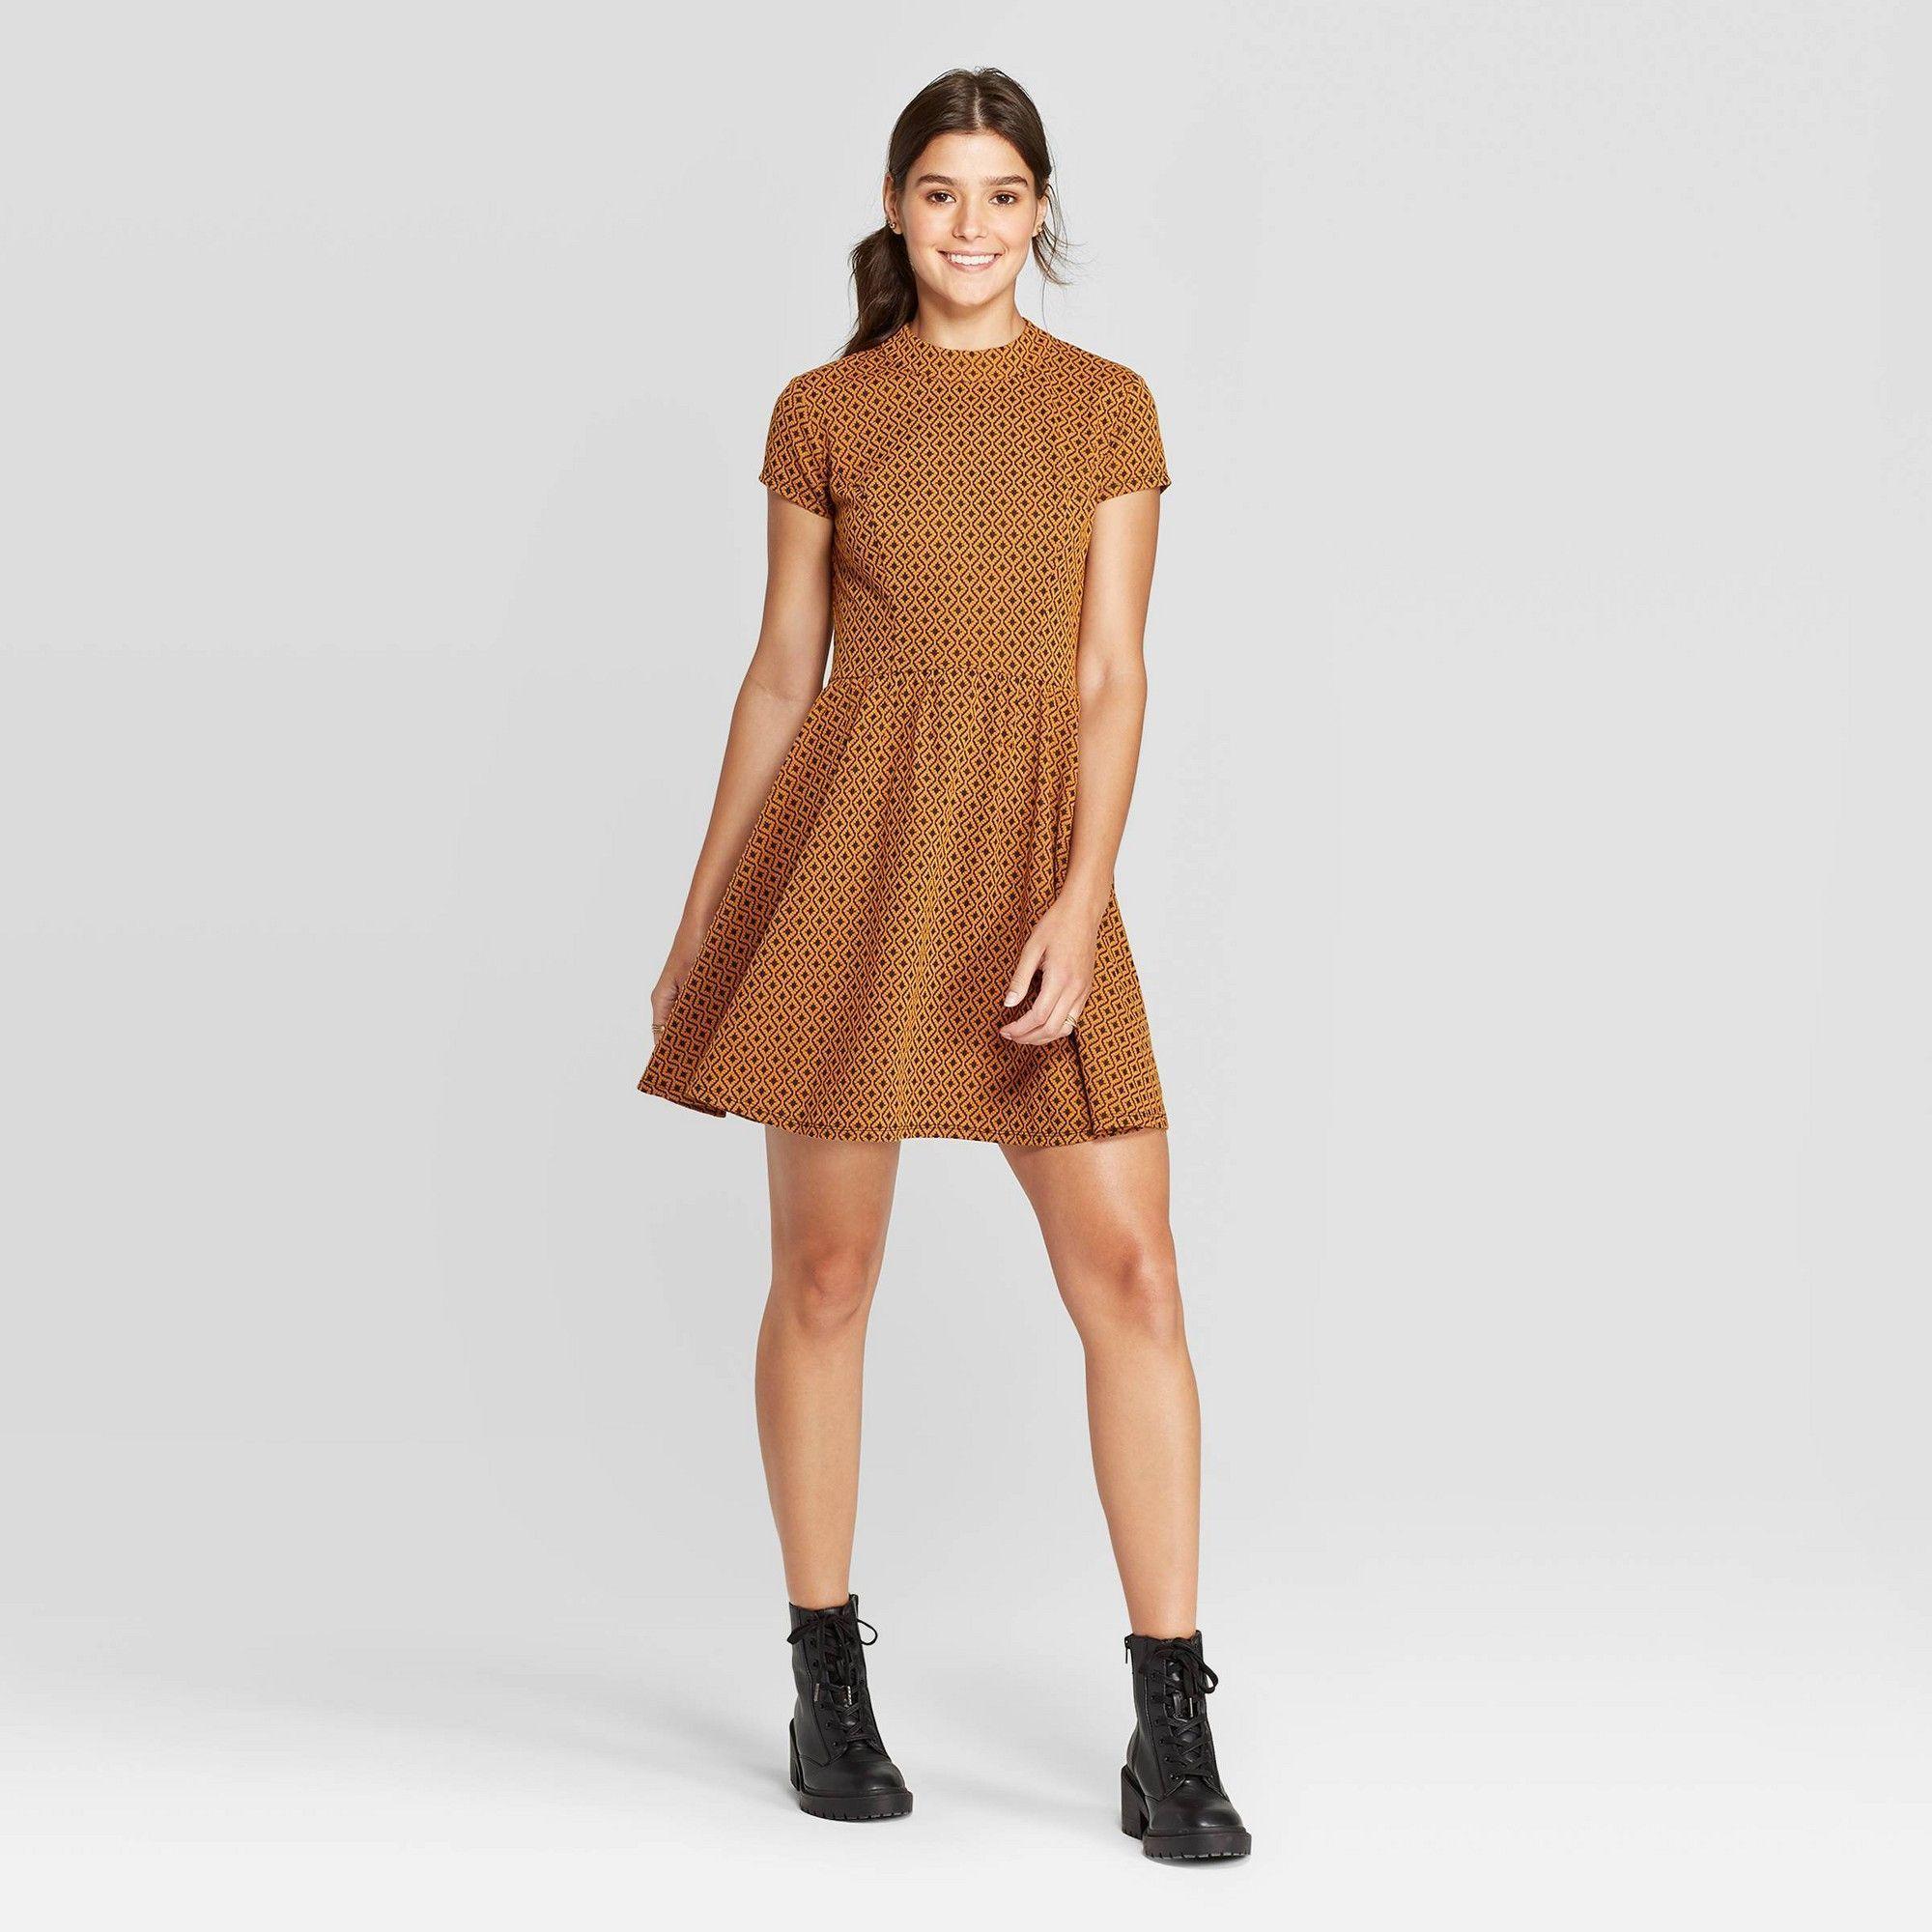 Women S Short Sleeve Mock Turtleneck Knit Mini Dress Xhilaration Mustard Xxl Women S Yell Knit Mini Dress Mini Dress Mini Velvet Dress [ 2000 x 2000 Pixel ]